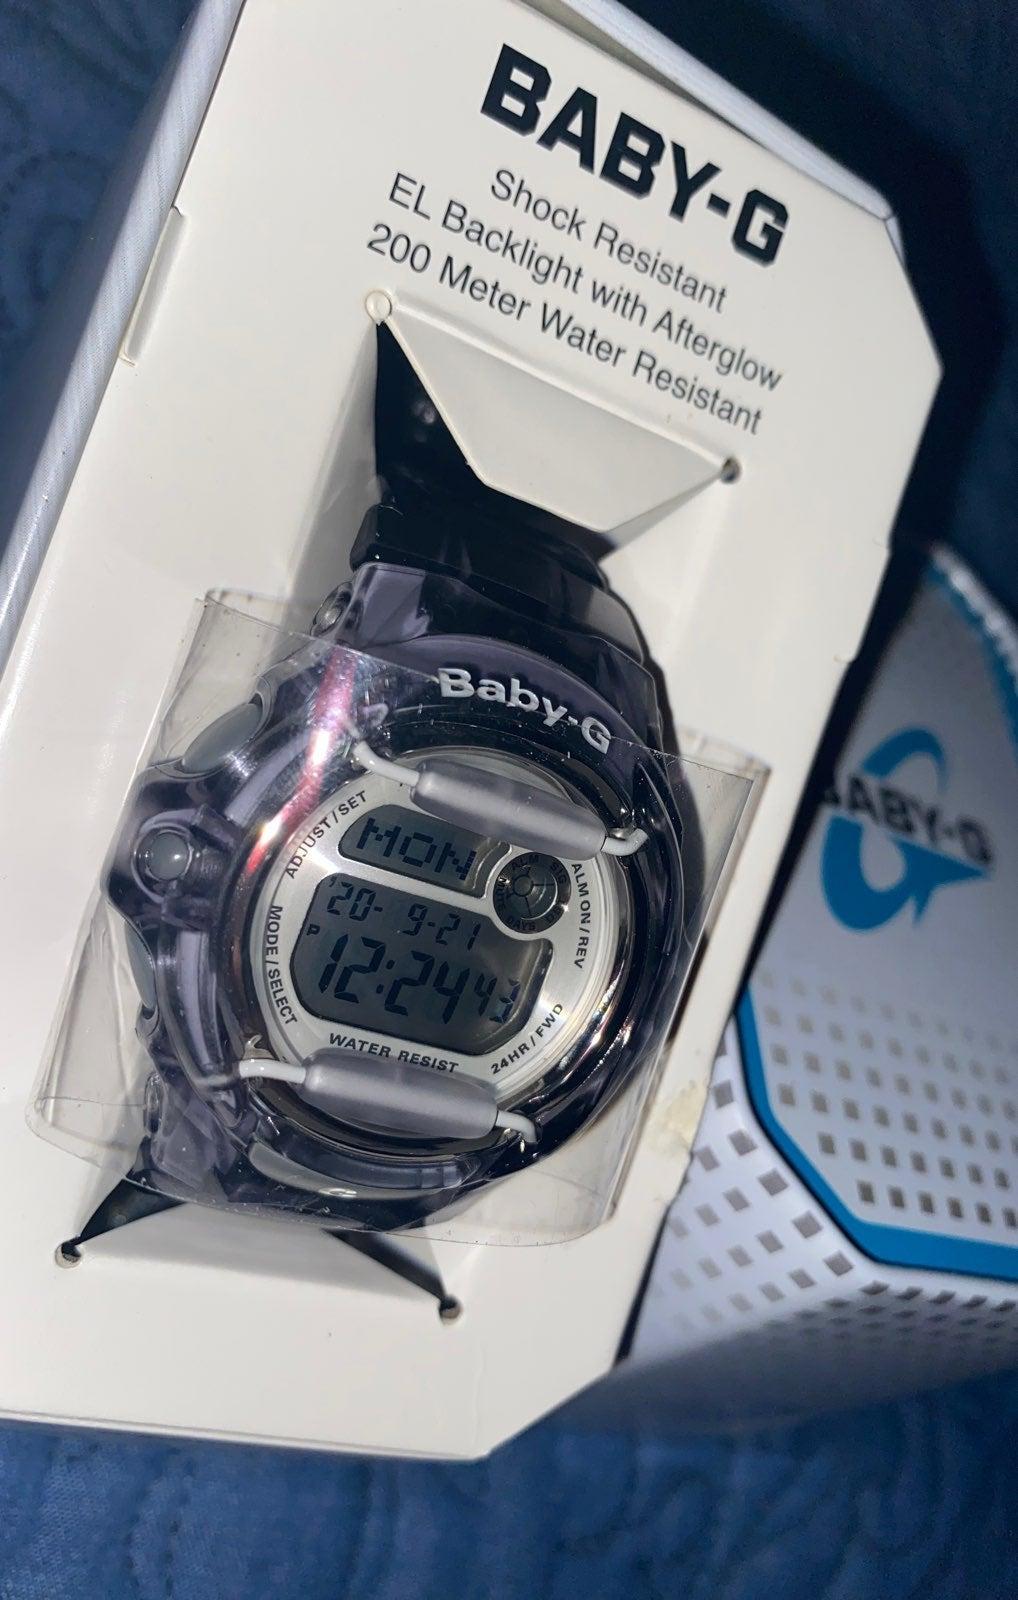 Baby g watches